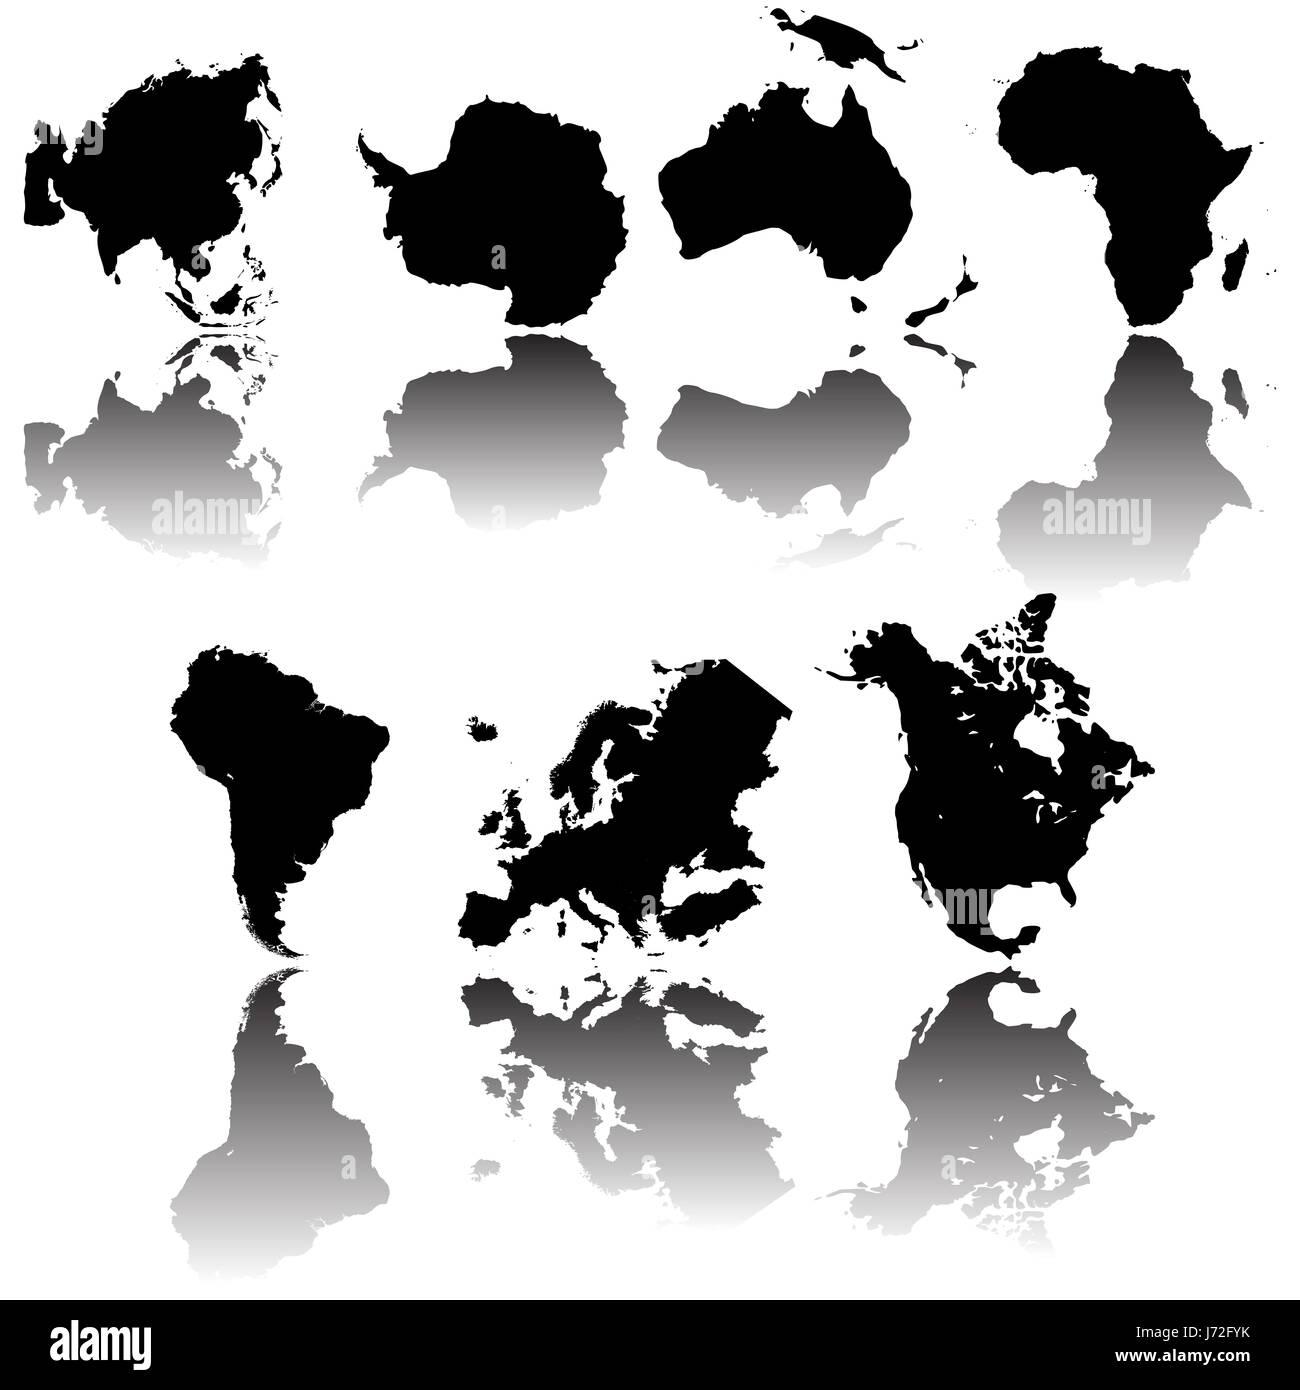 Asia africa australia america antarctica atlas atlantic map of the asia africa australia america antarctica atlas atlantic map of the world map gumiabroncs Choice Image